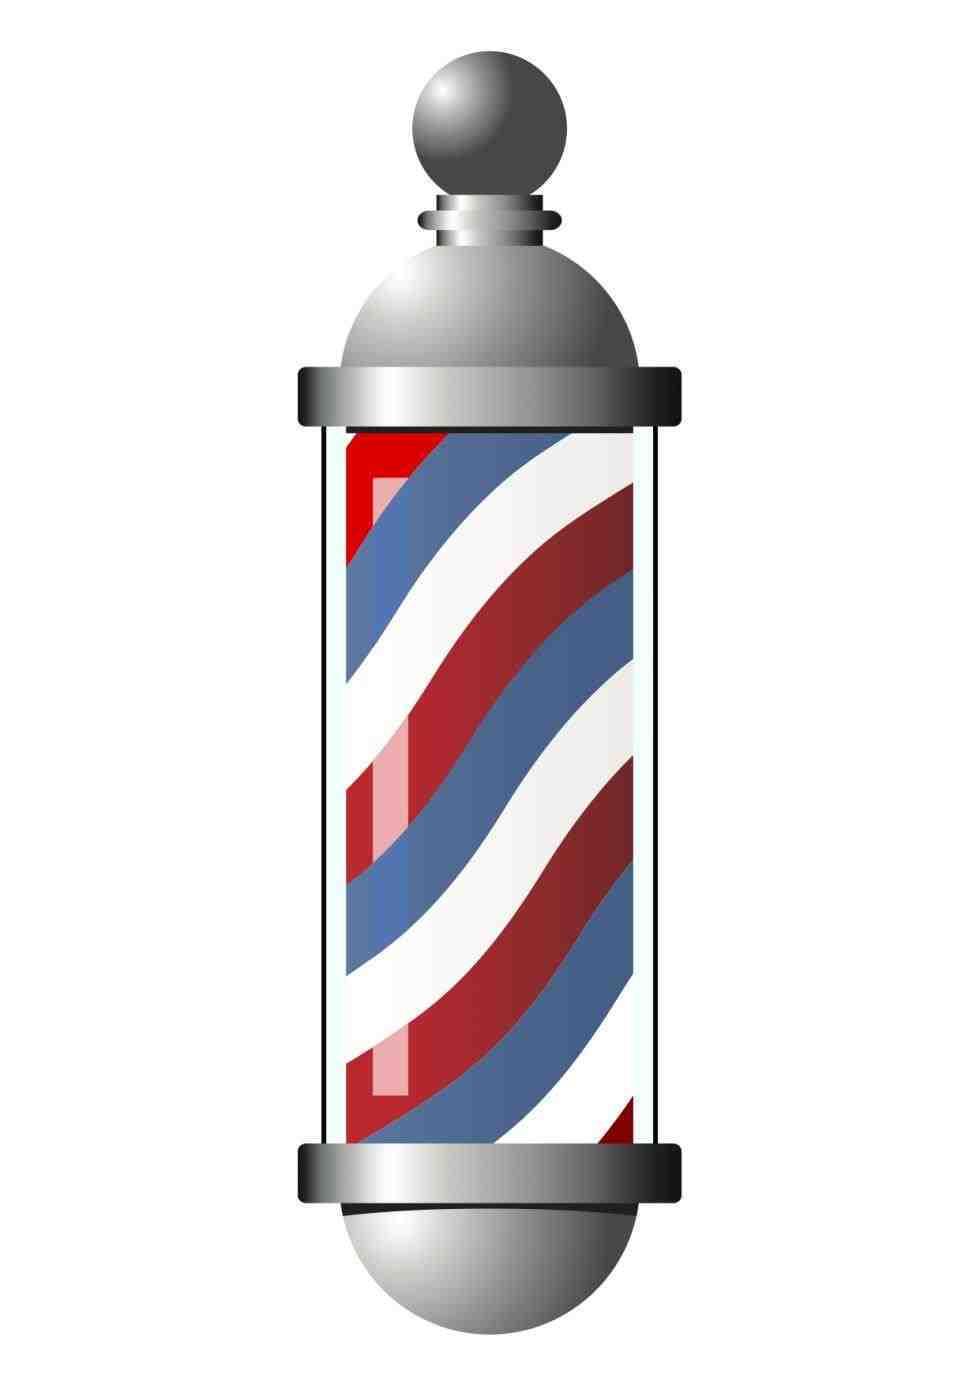 980x1386 Image Barber Shop Pole Images Of Barber Pole Clipart Shop Clip Art